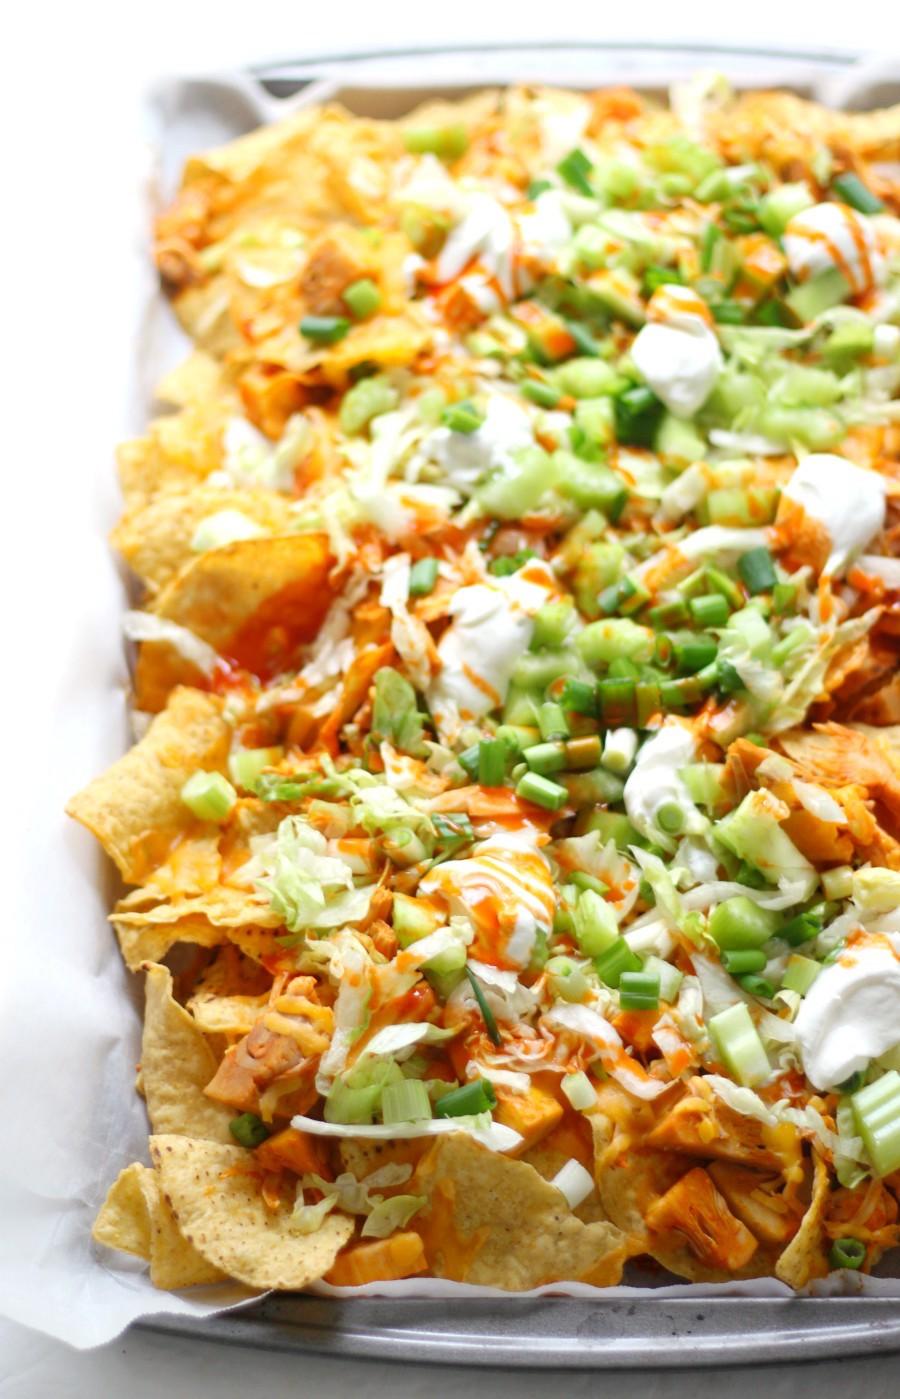 left-side-sheet-pan-vegan-buffalo-chicken-nachos